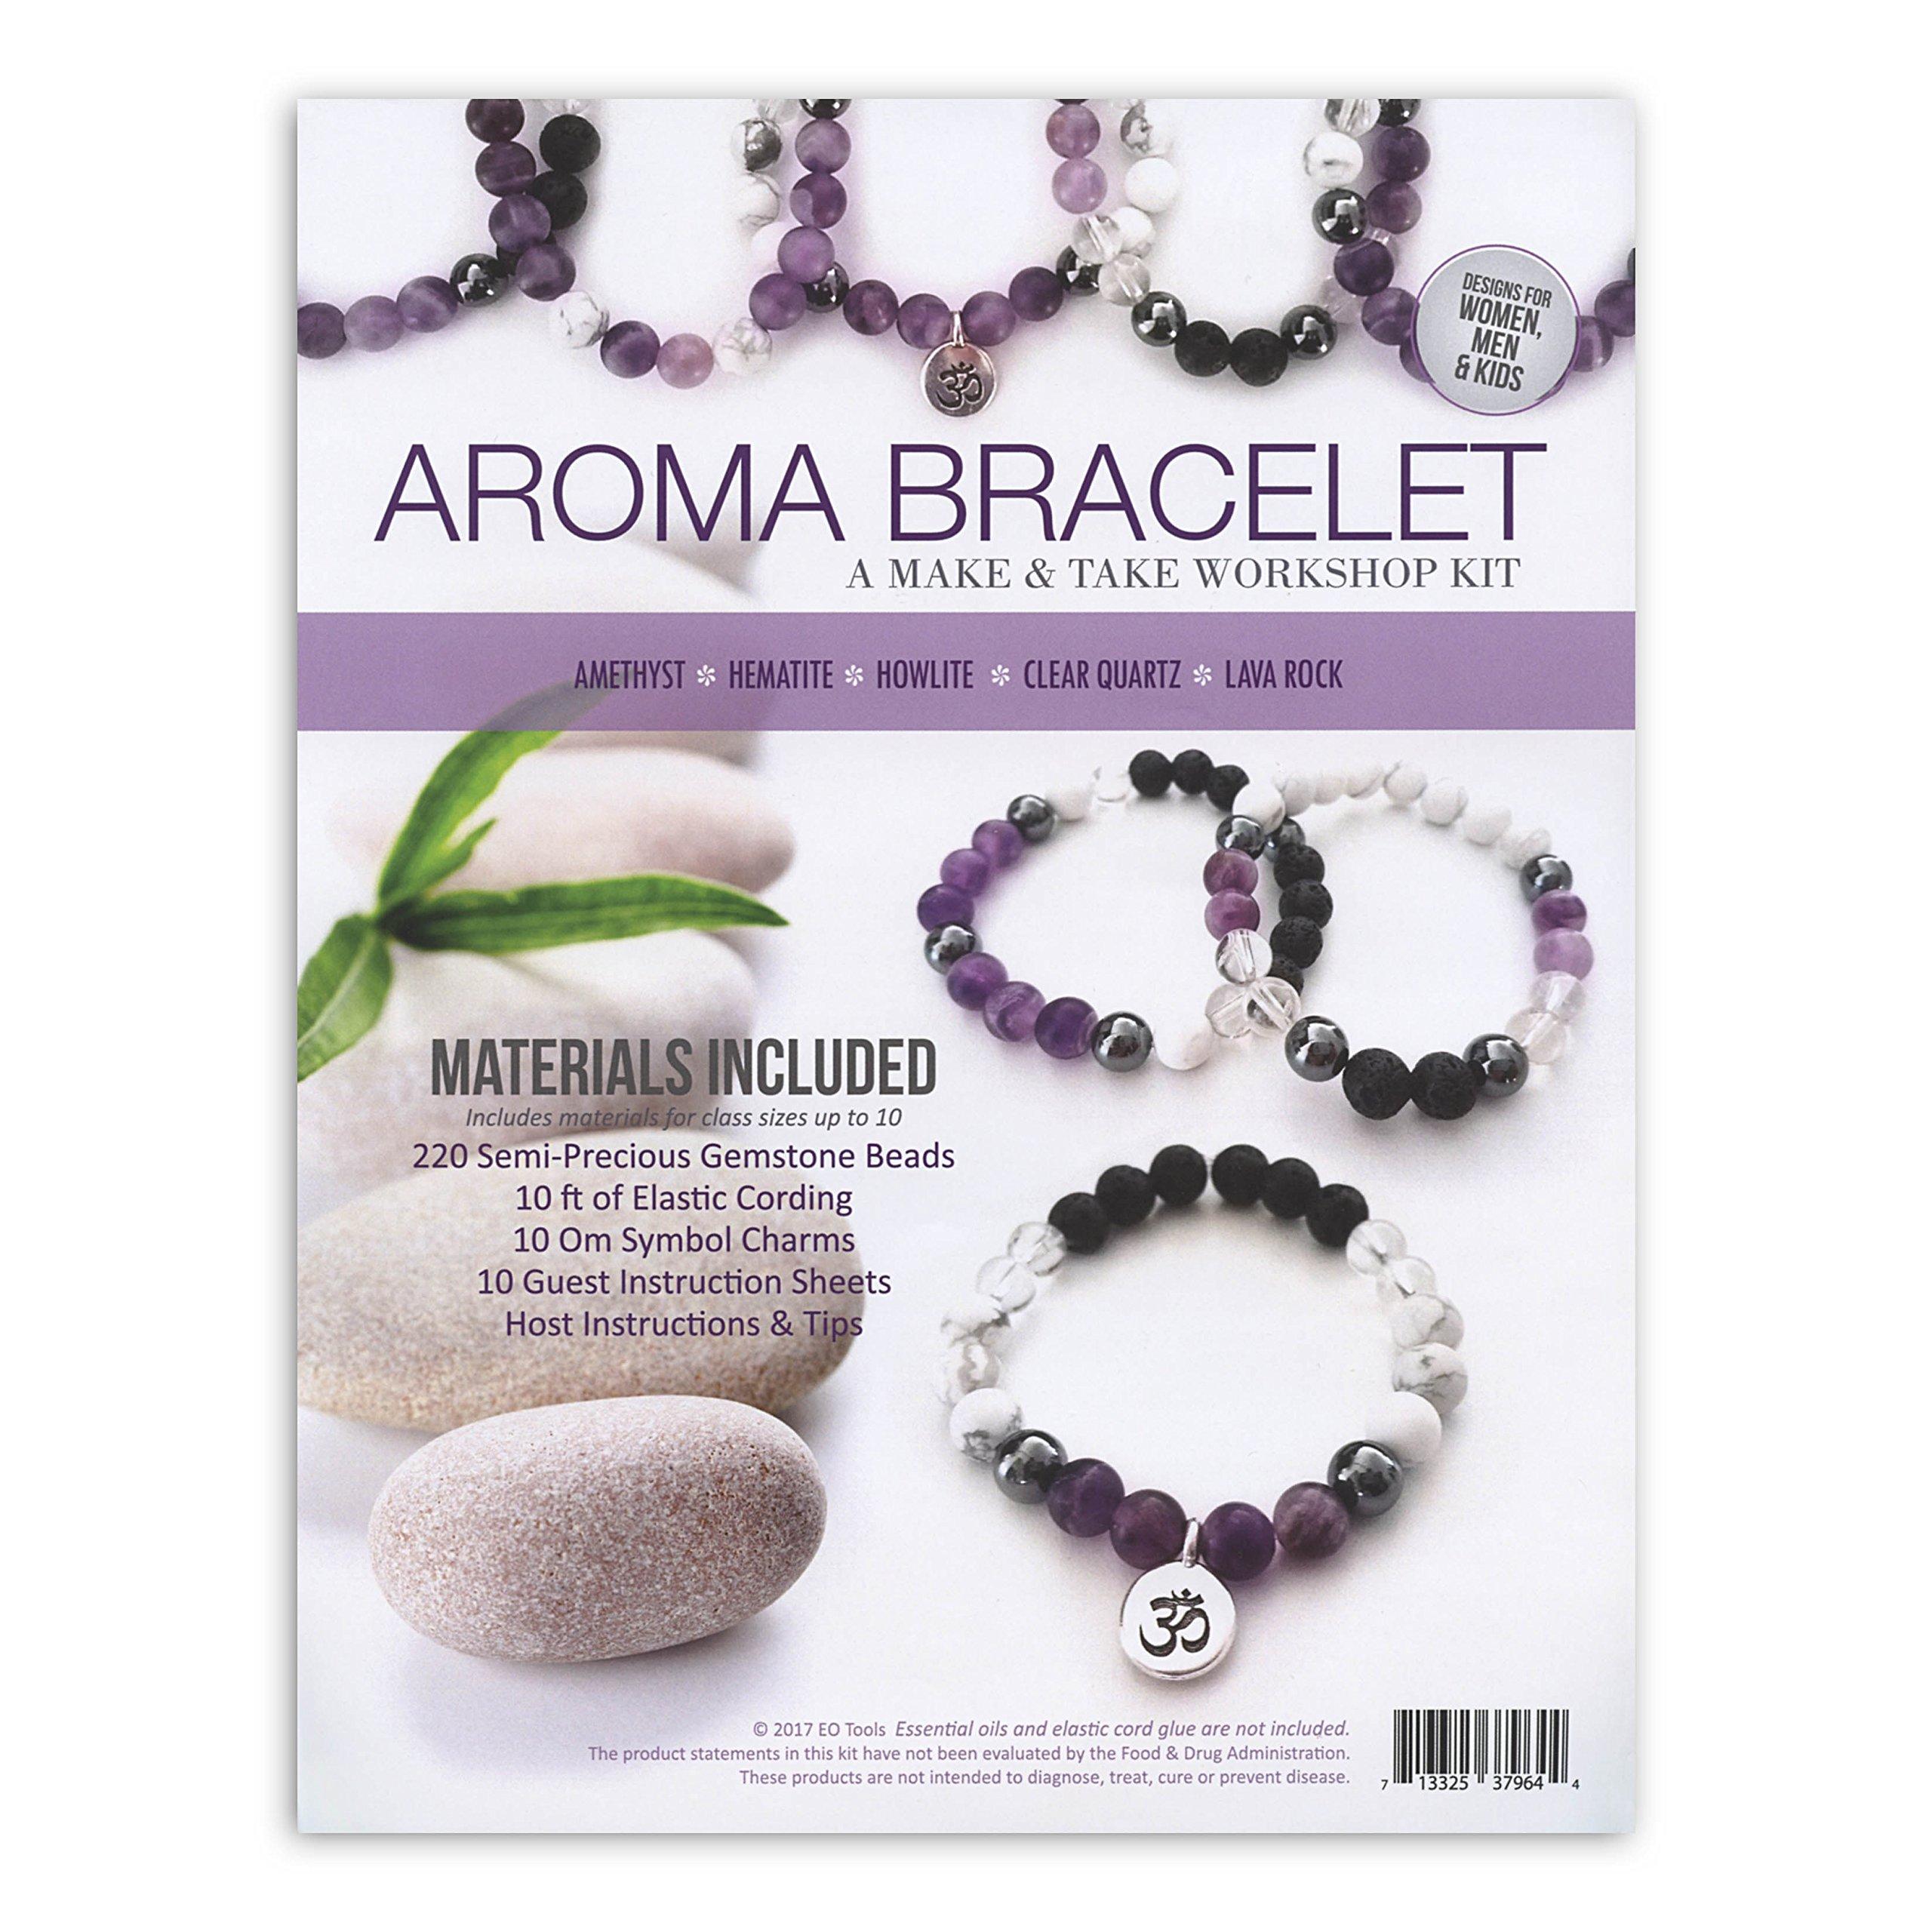 Amethyst Aroma Bracelet Make & Take Kit by EO Tools (Image #1)